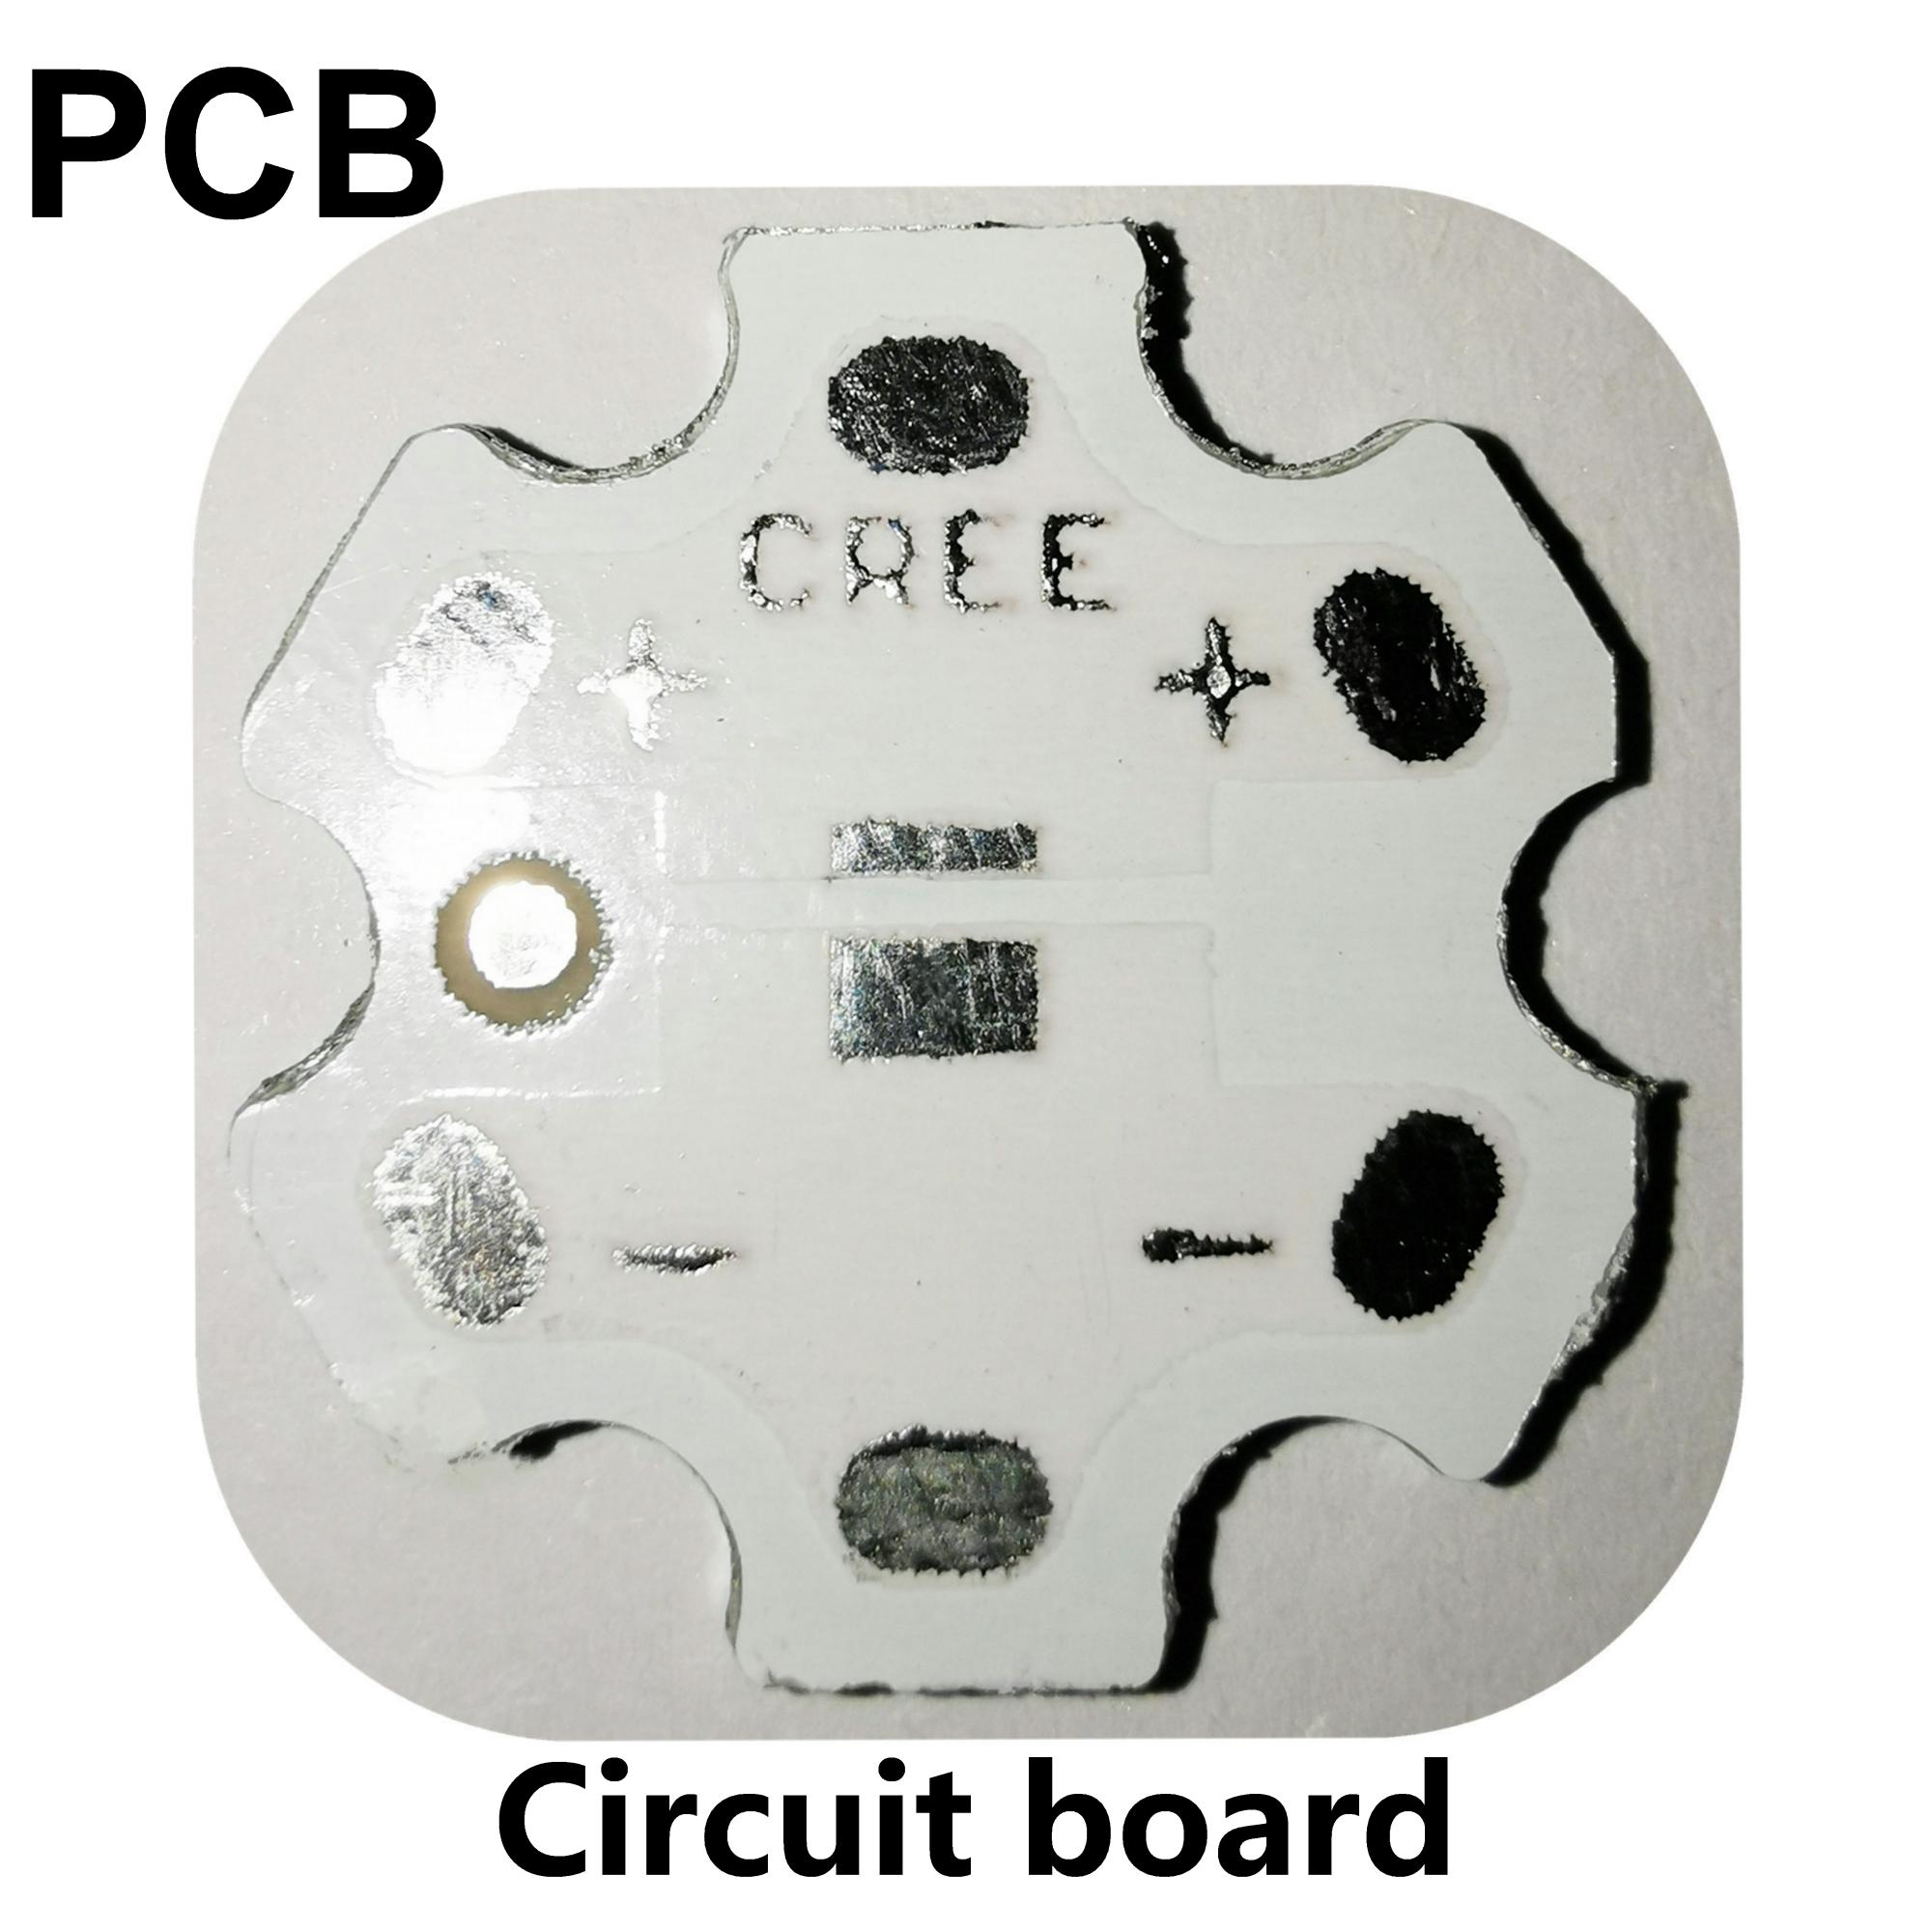 200 pcs 20MM PCB 3030 3535 5050 pad can replace 2835 3020 3528 aluminum substrate 6-corner circuit board diameter 19.5mm-20mm